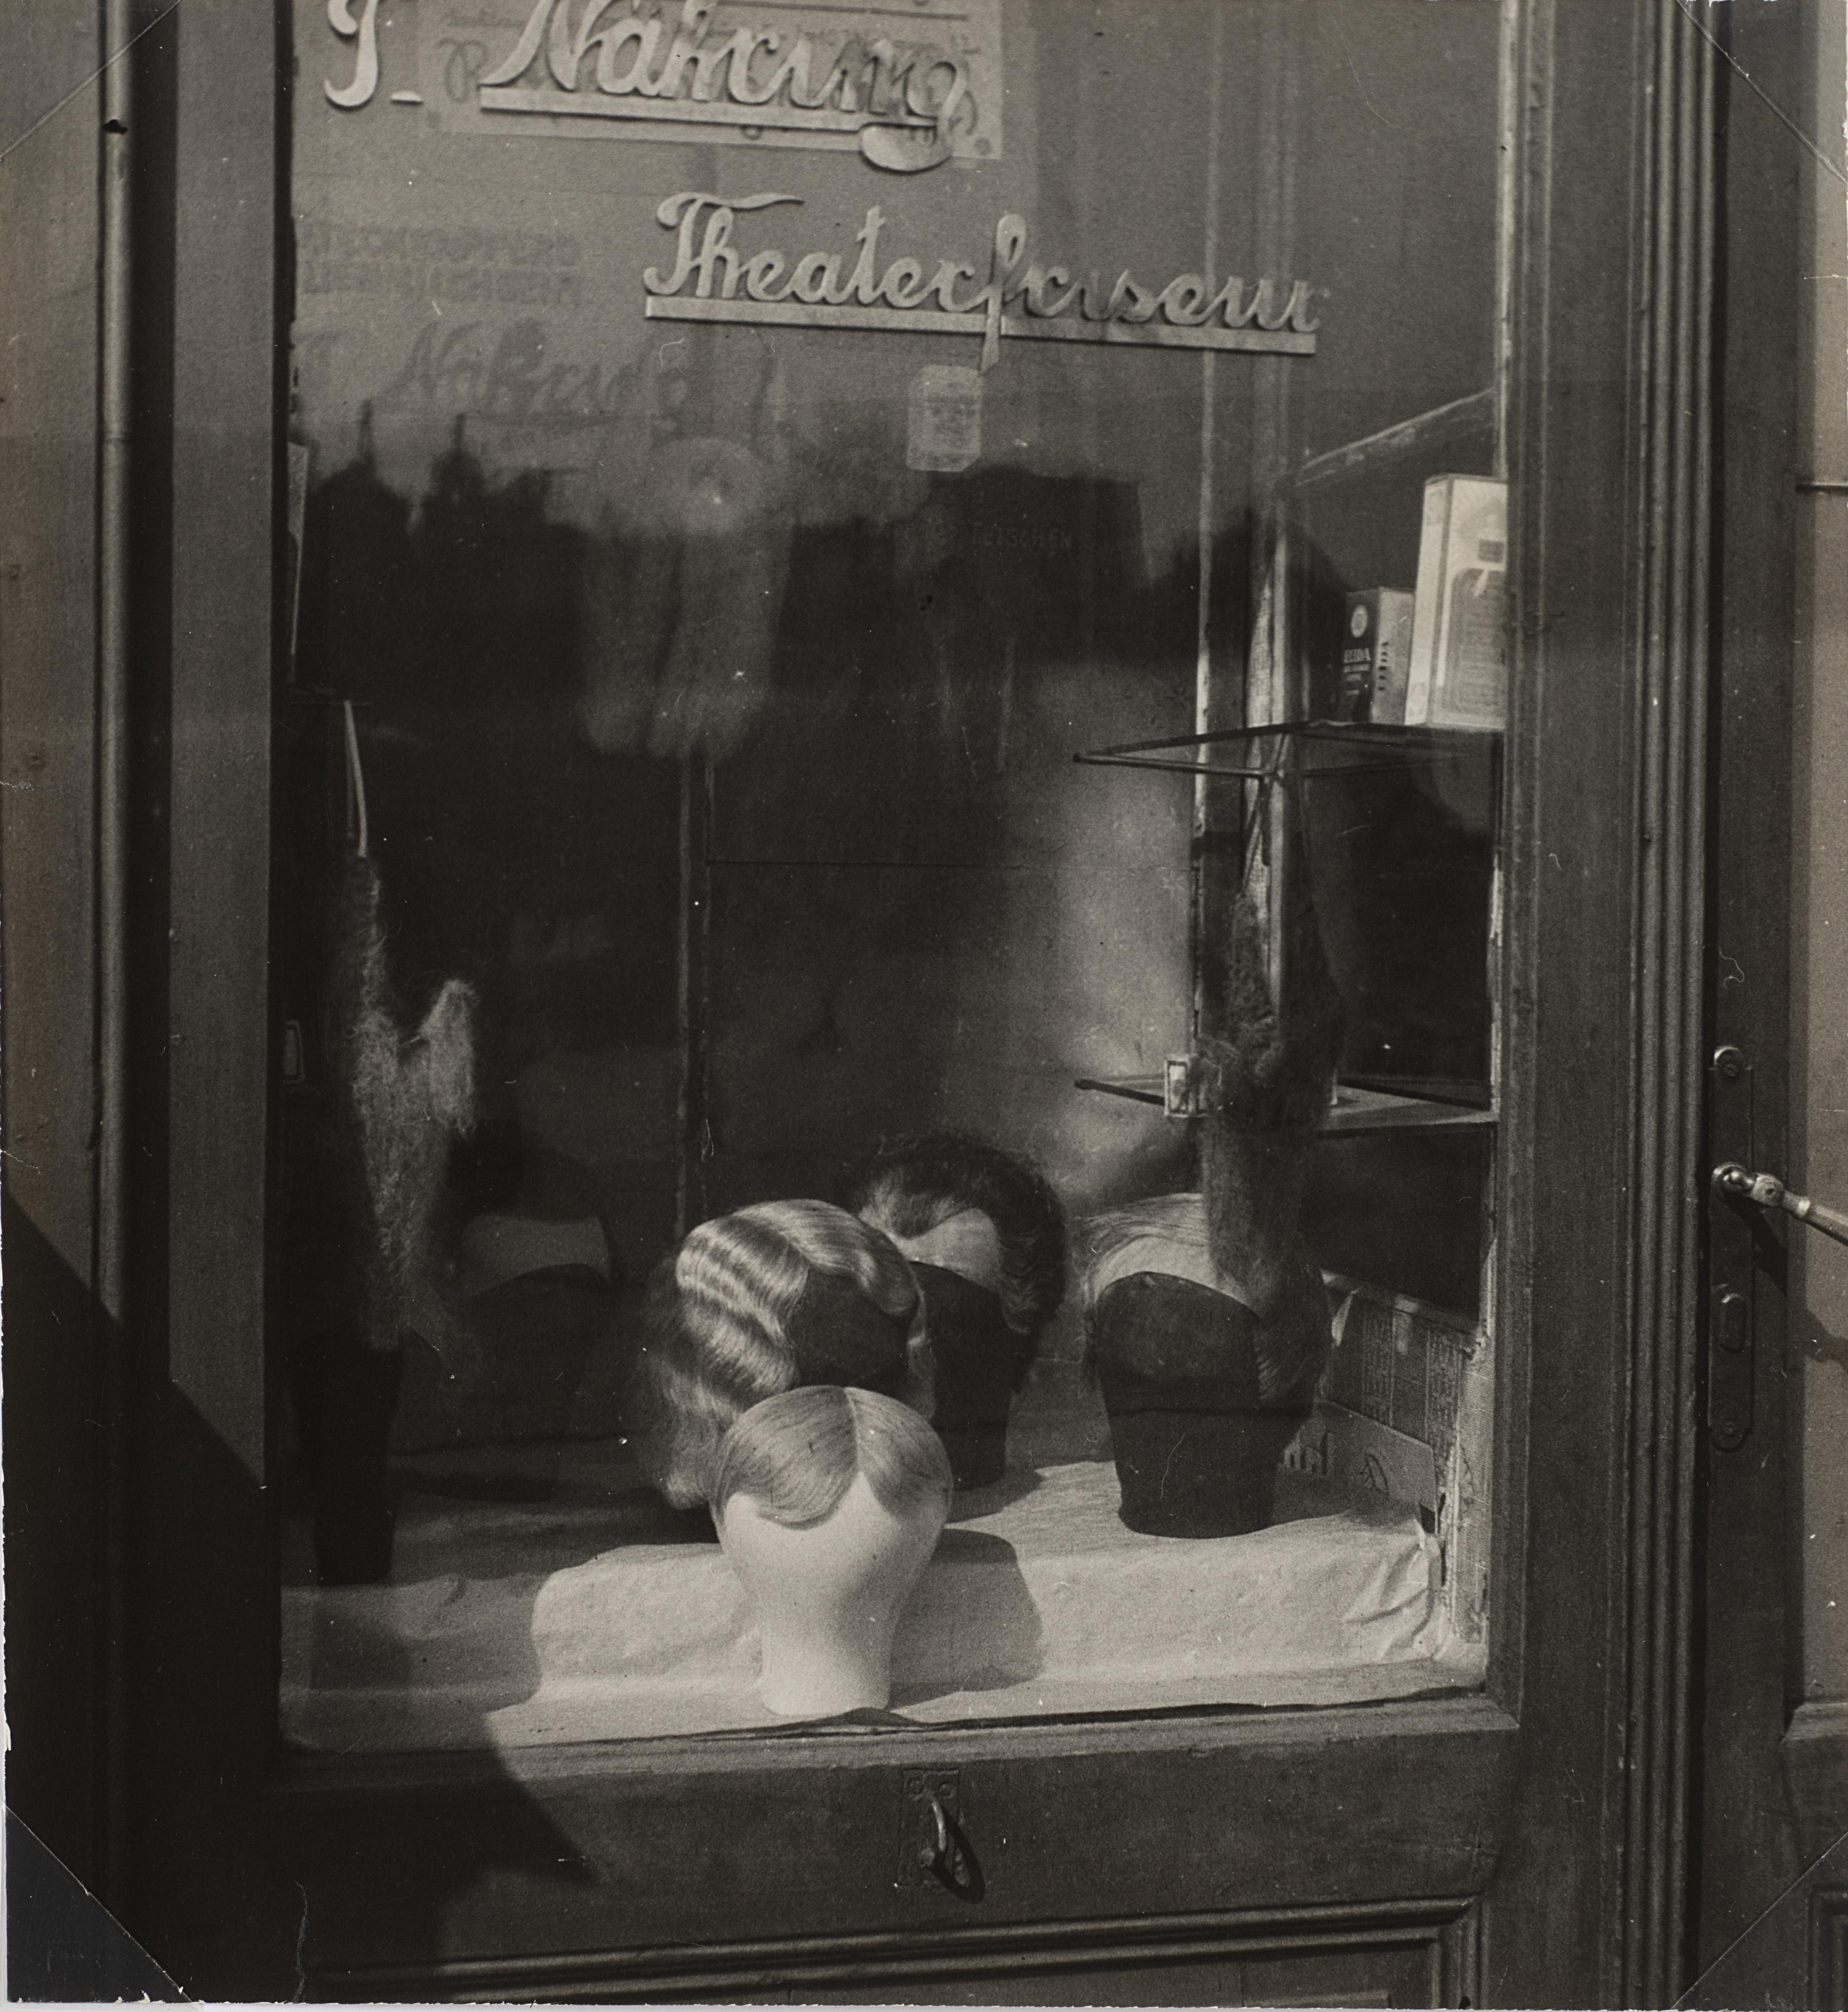 Untitled, Jindrich Styrsky. 1935, Vintage gelatin print with silver salts, 29 x 27 cm. € 5.500 - 6.500. Photo: Finarte